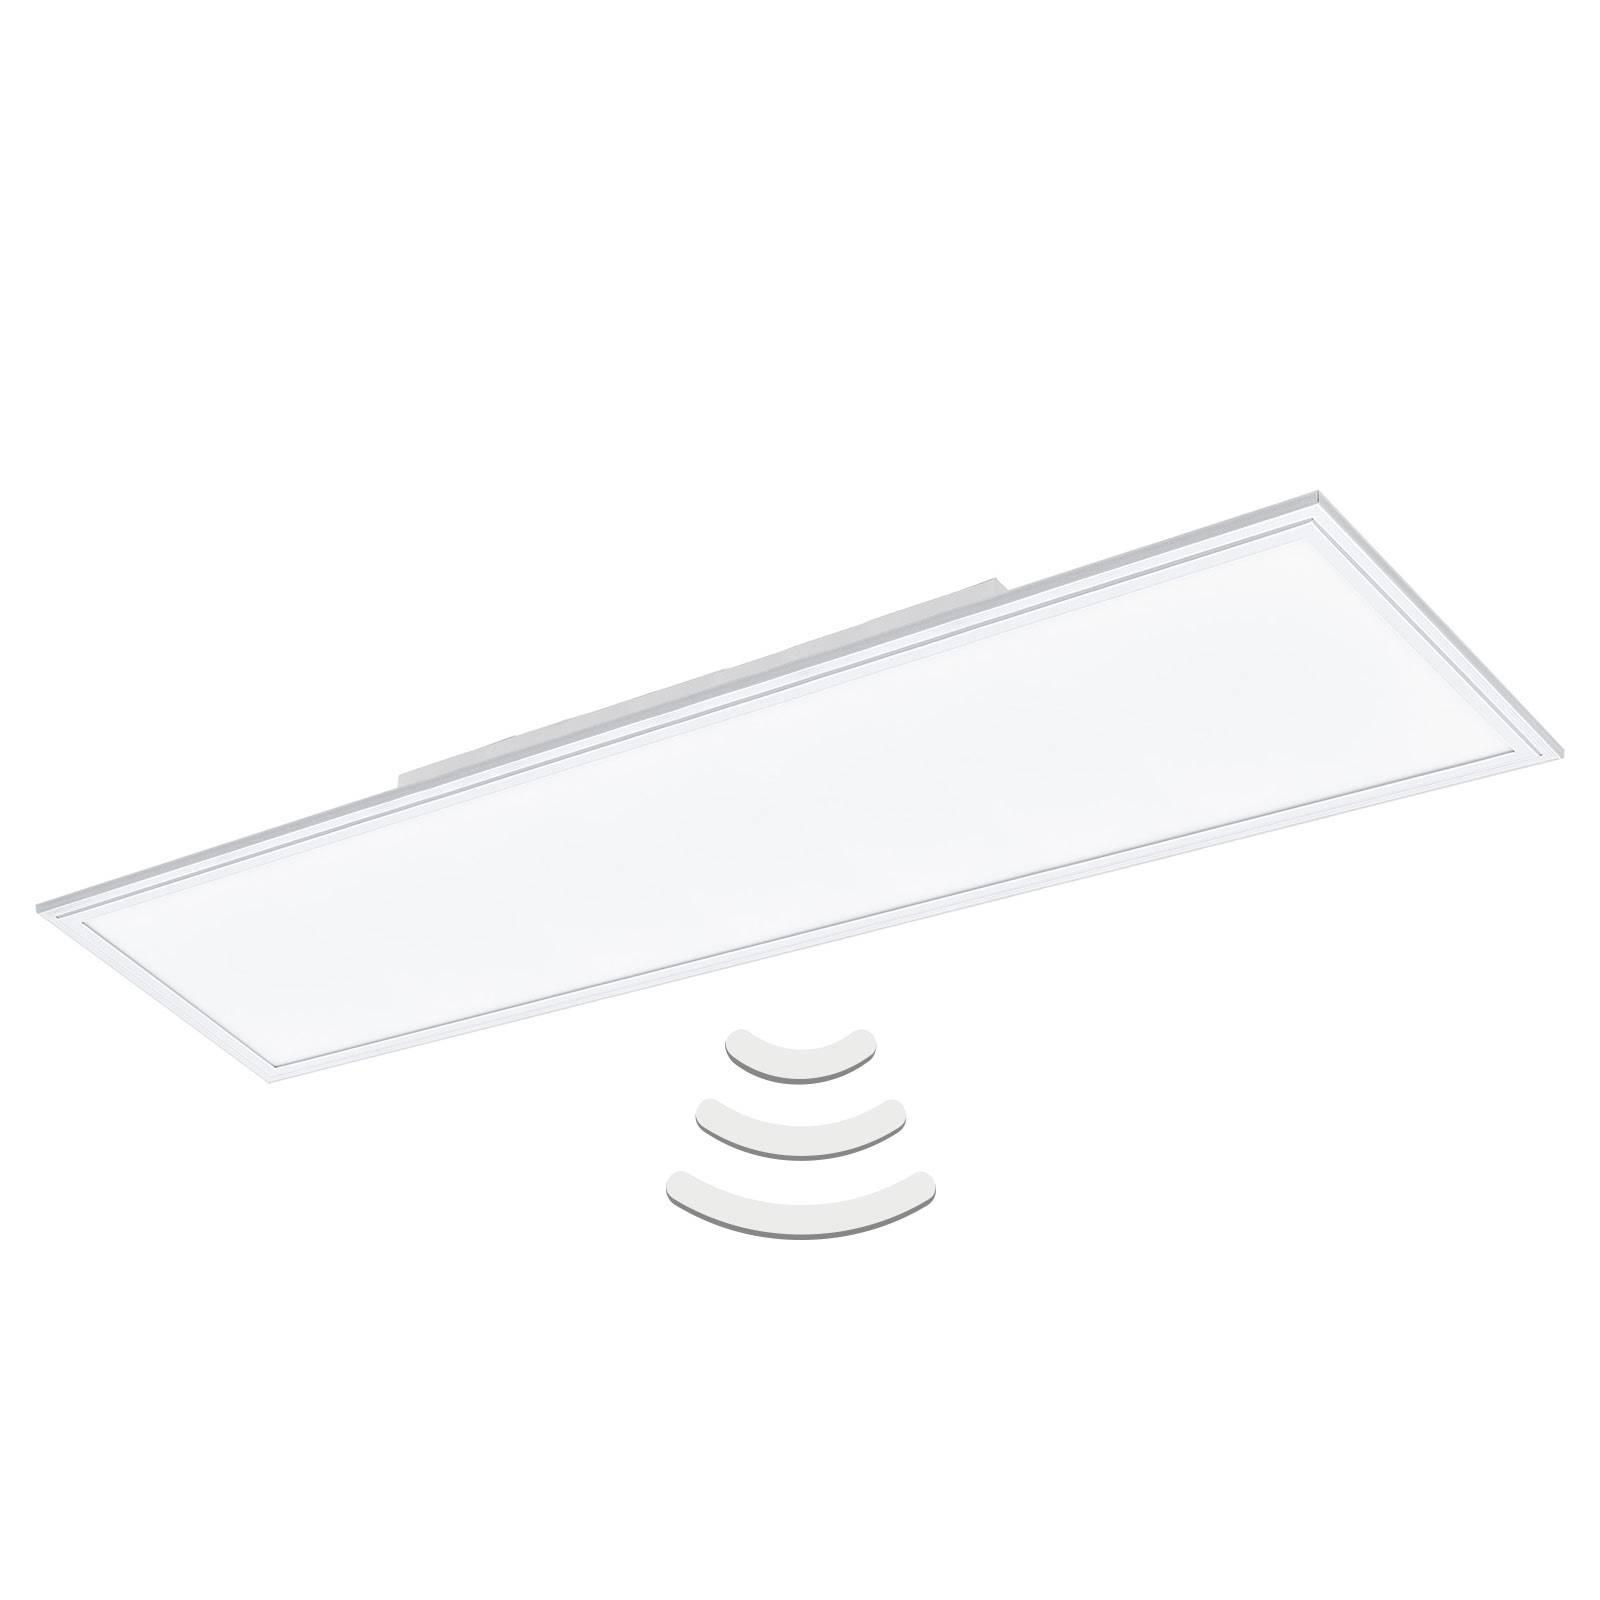 LED plafondlamp Salobrena-M 119,5x29,5 cm sensor